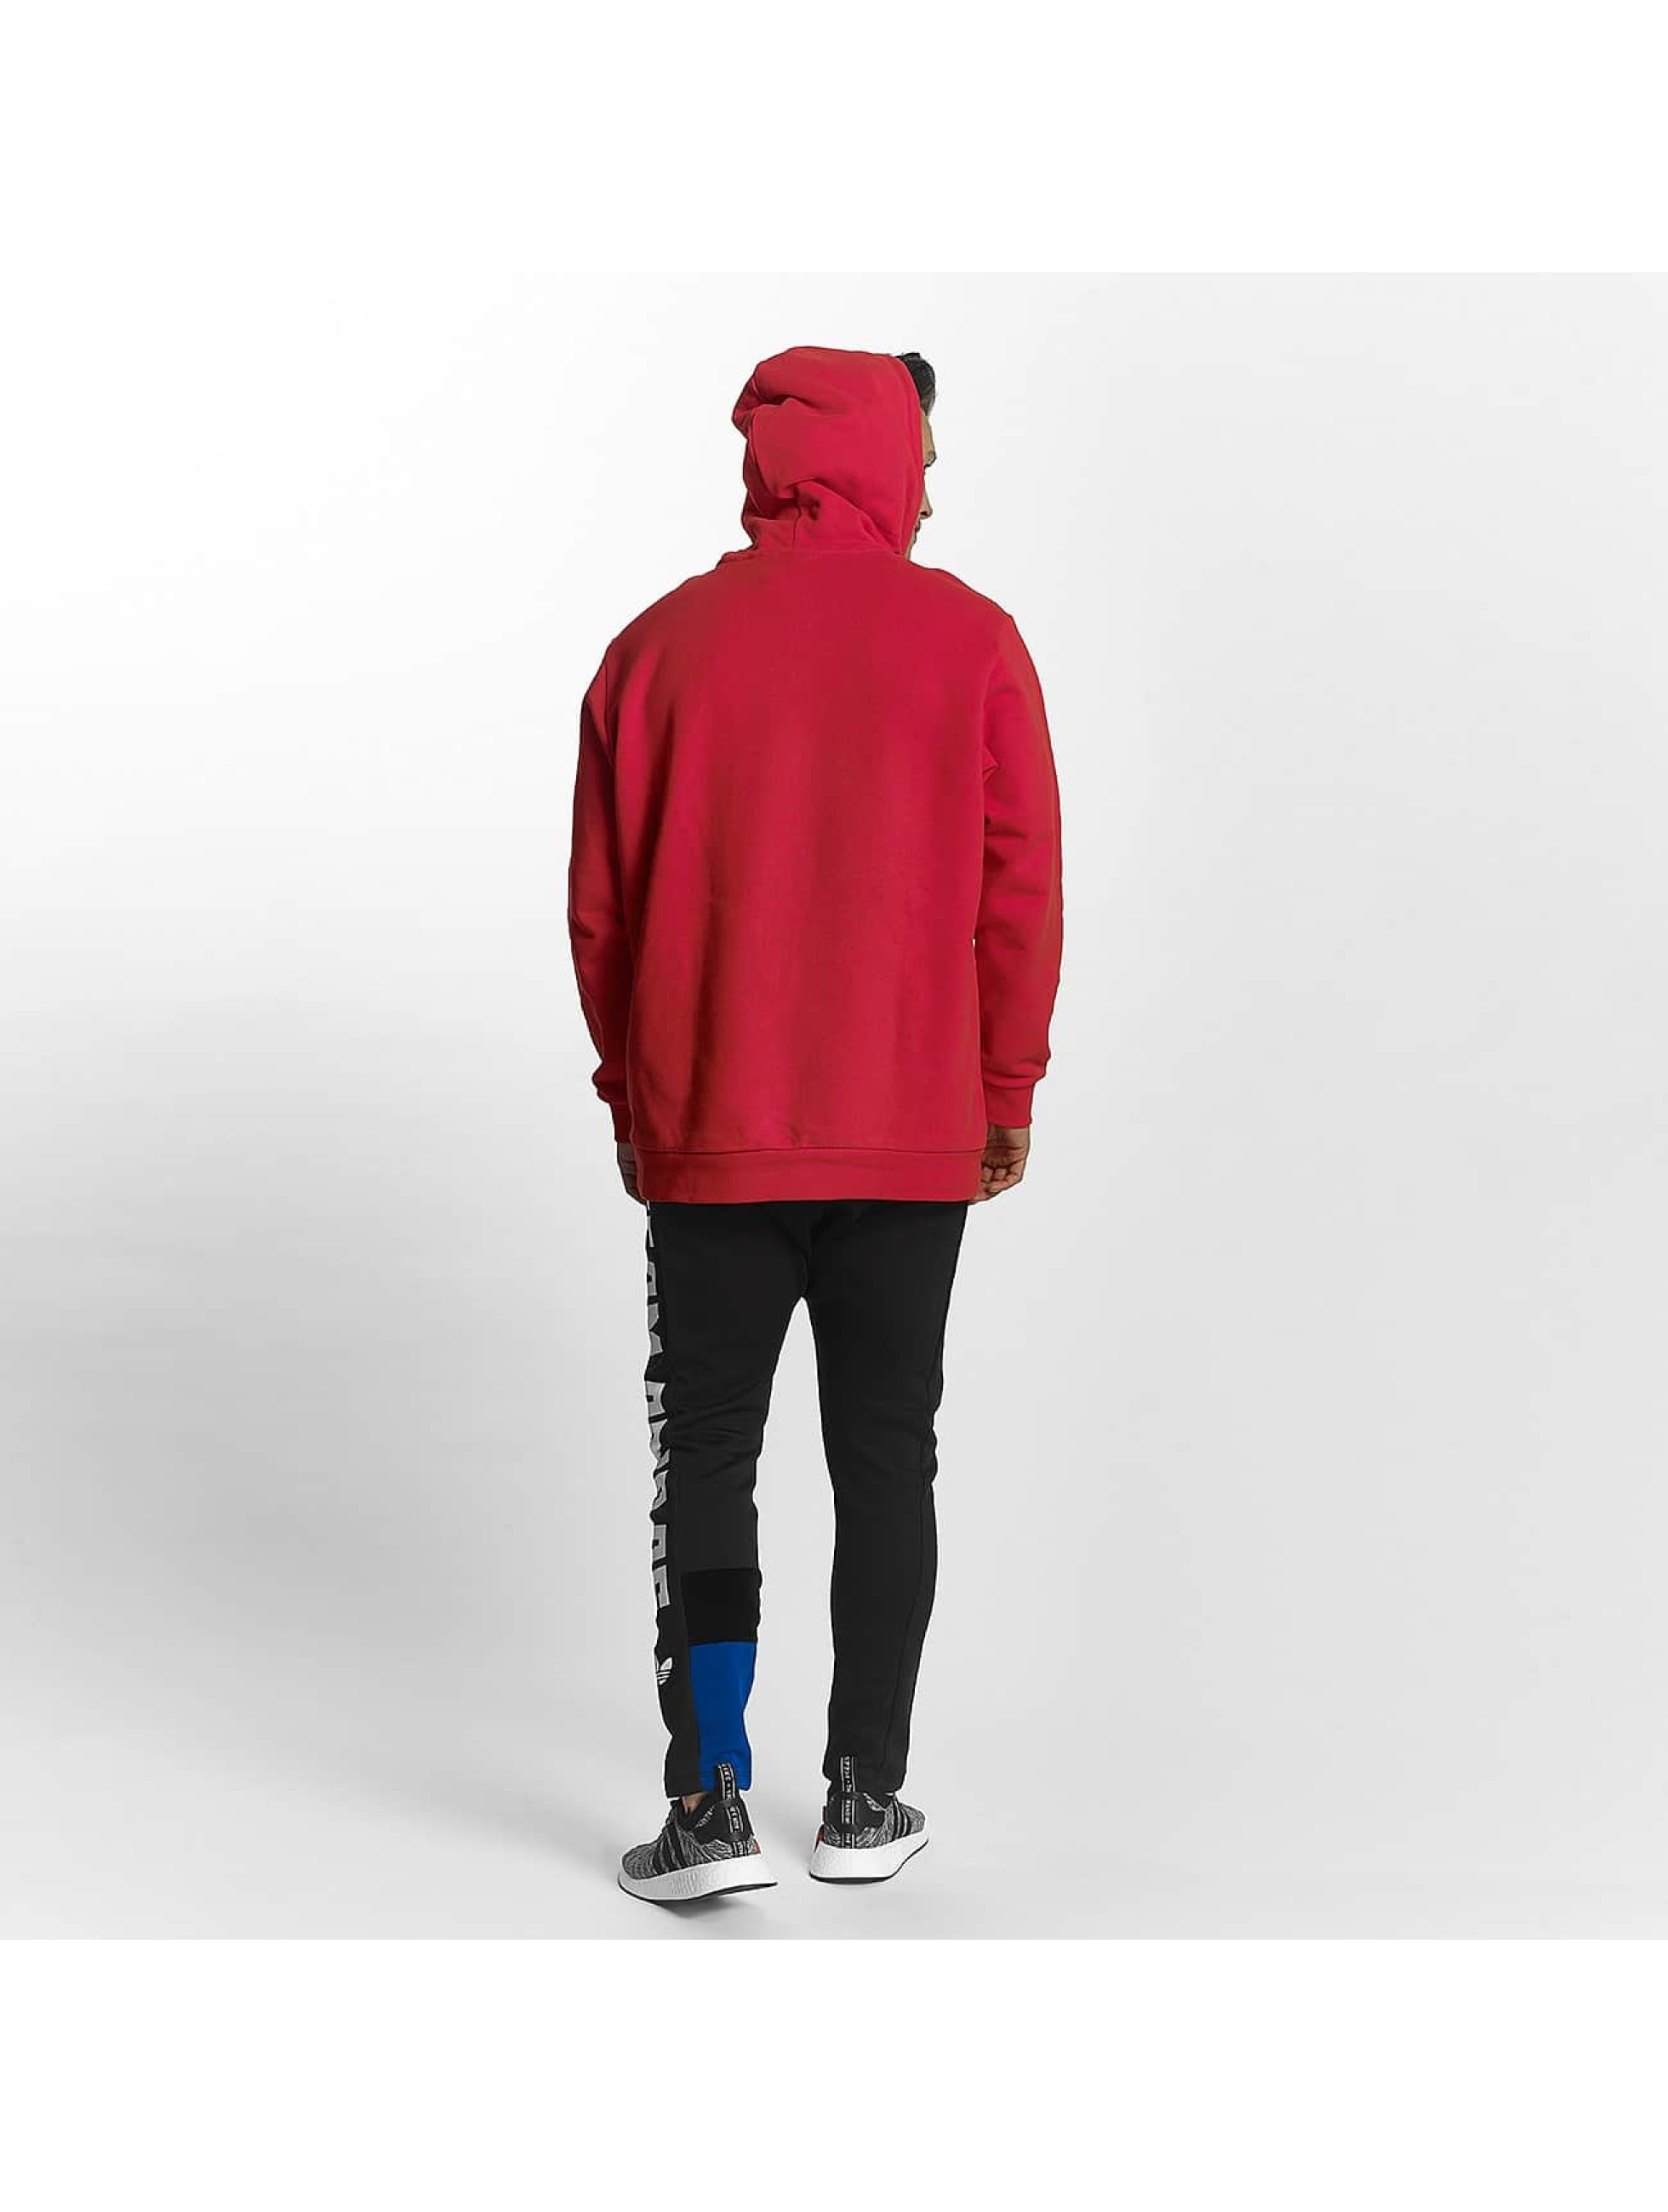 adidas originals Hoodie Anichkov red